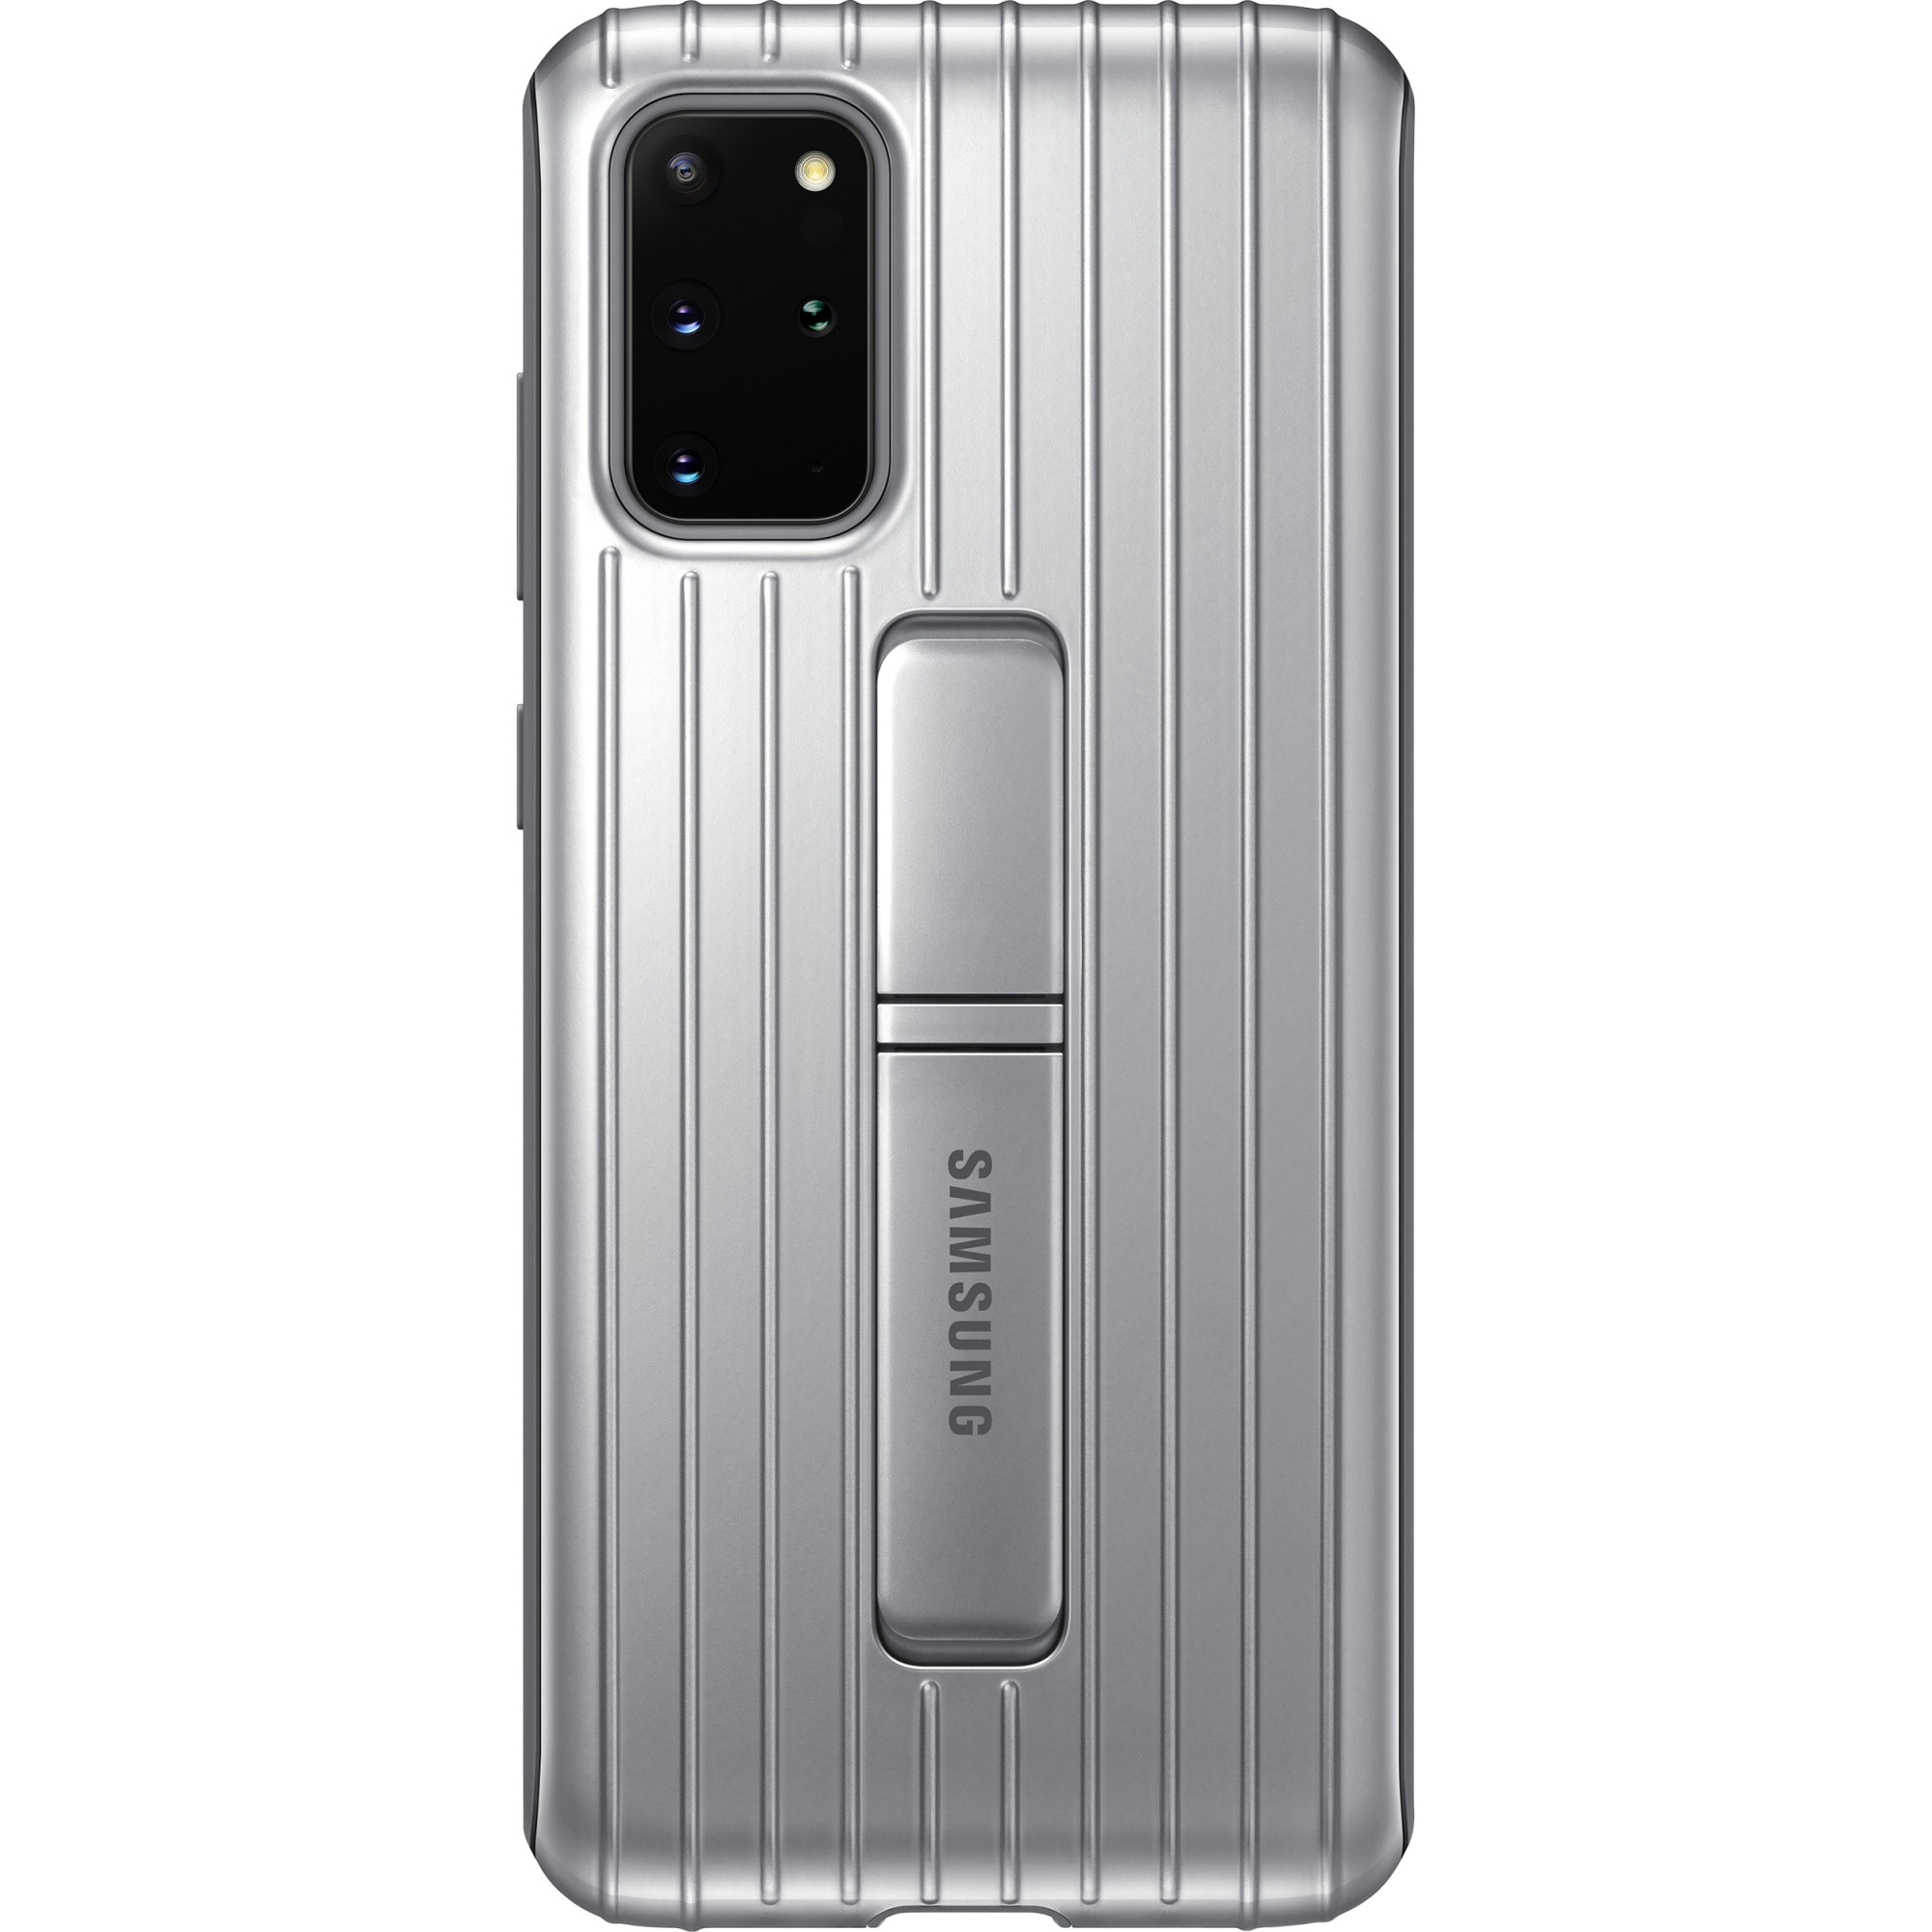 Fotografie Husa de protectie Samsung Protective Standing Cover pentru Galaxy S20 Plus, Silver